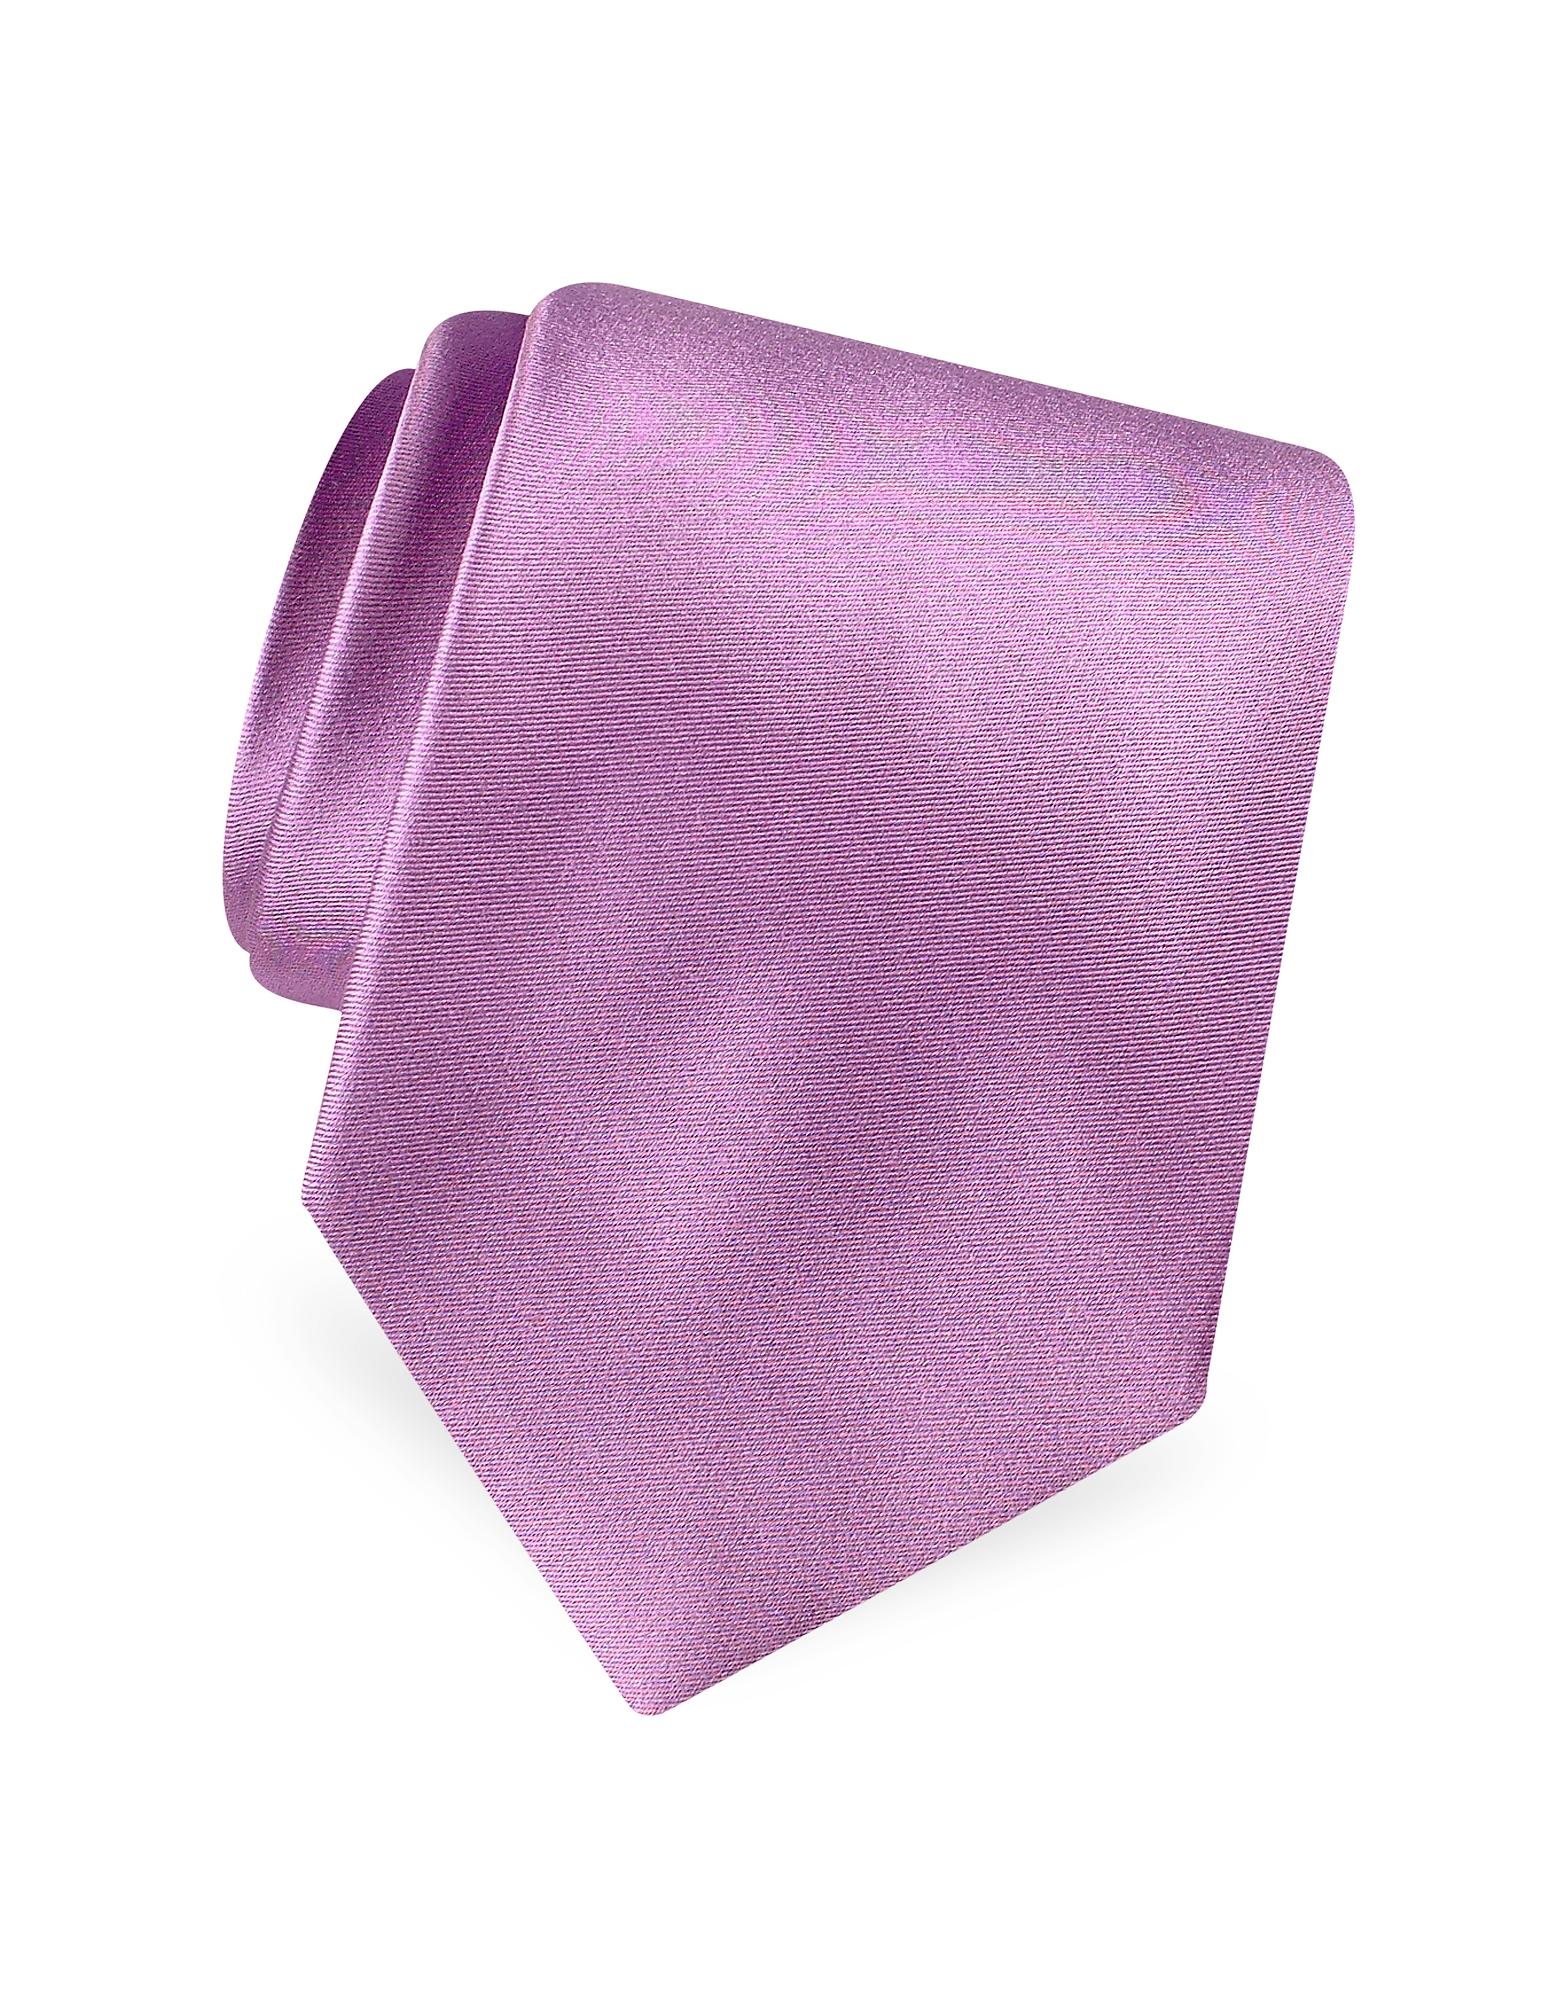 Forzieri Designer Ties, Solid Pure Silk Satin Silk Tie